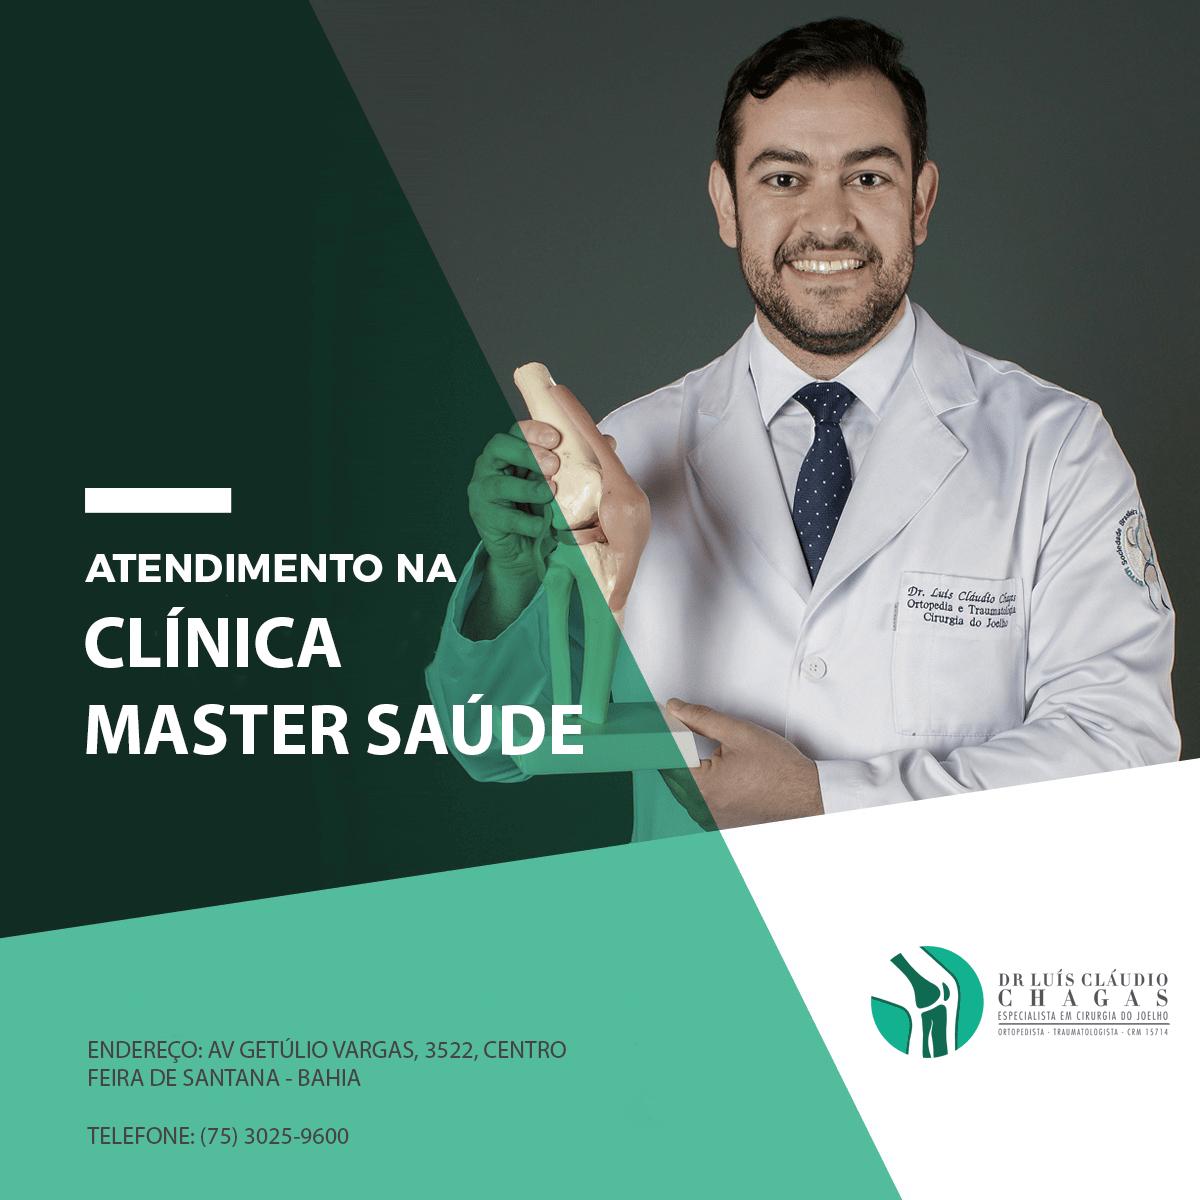 Clinica Master Saude-1200x1200